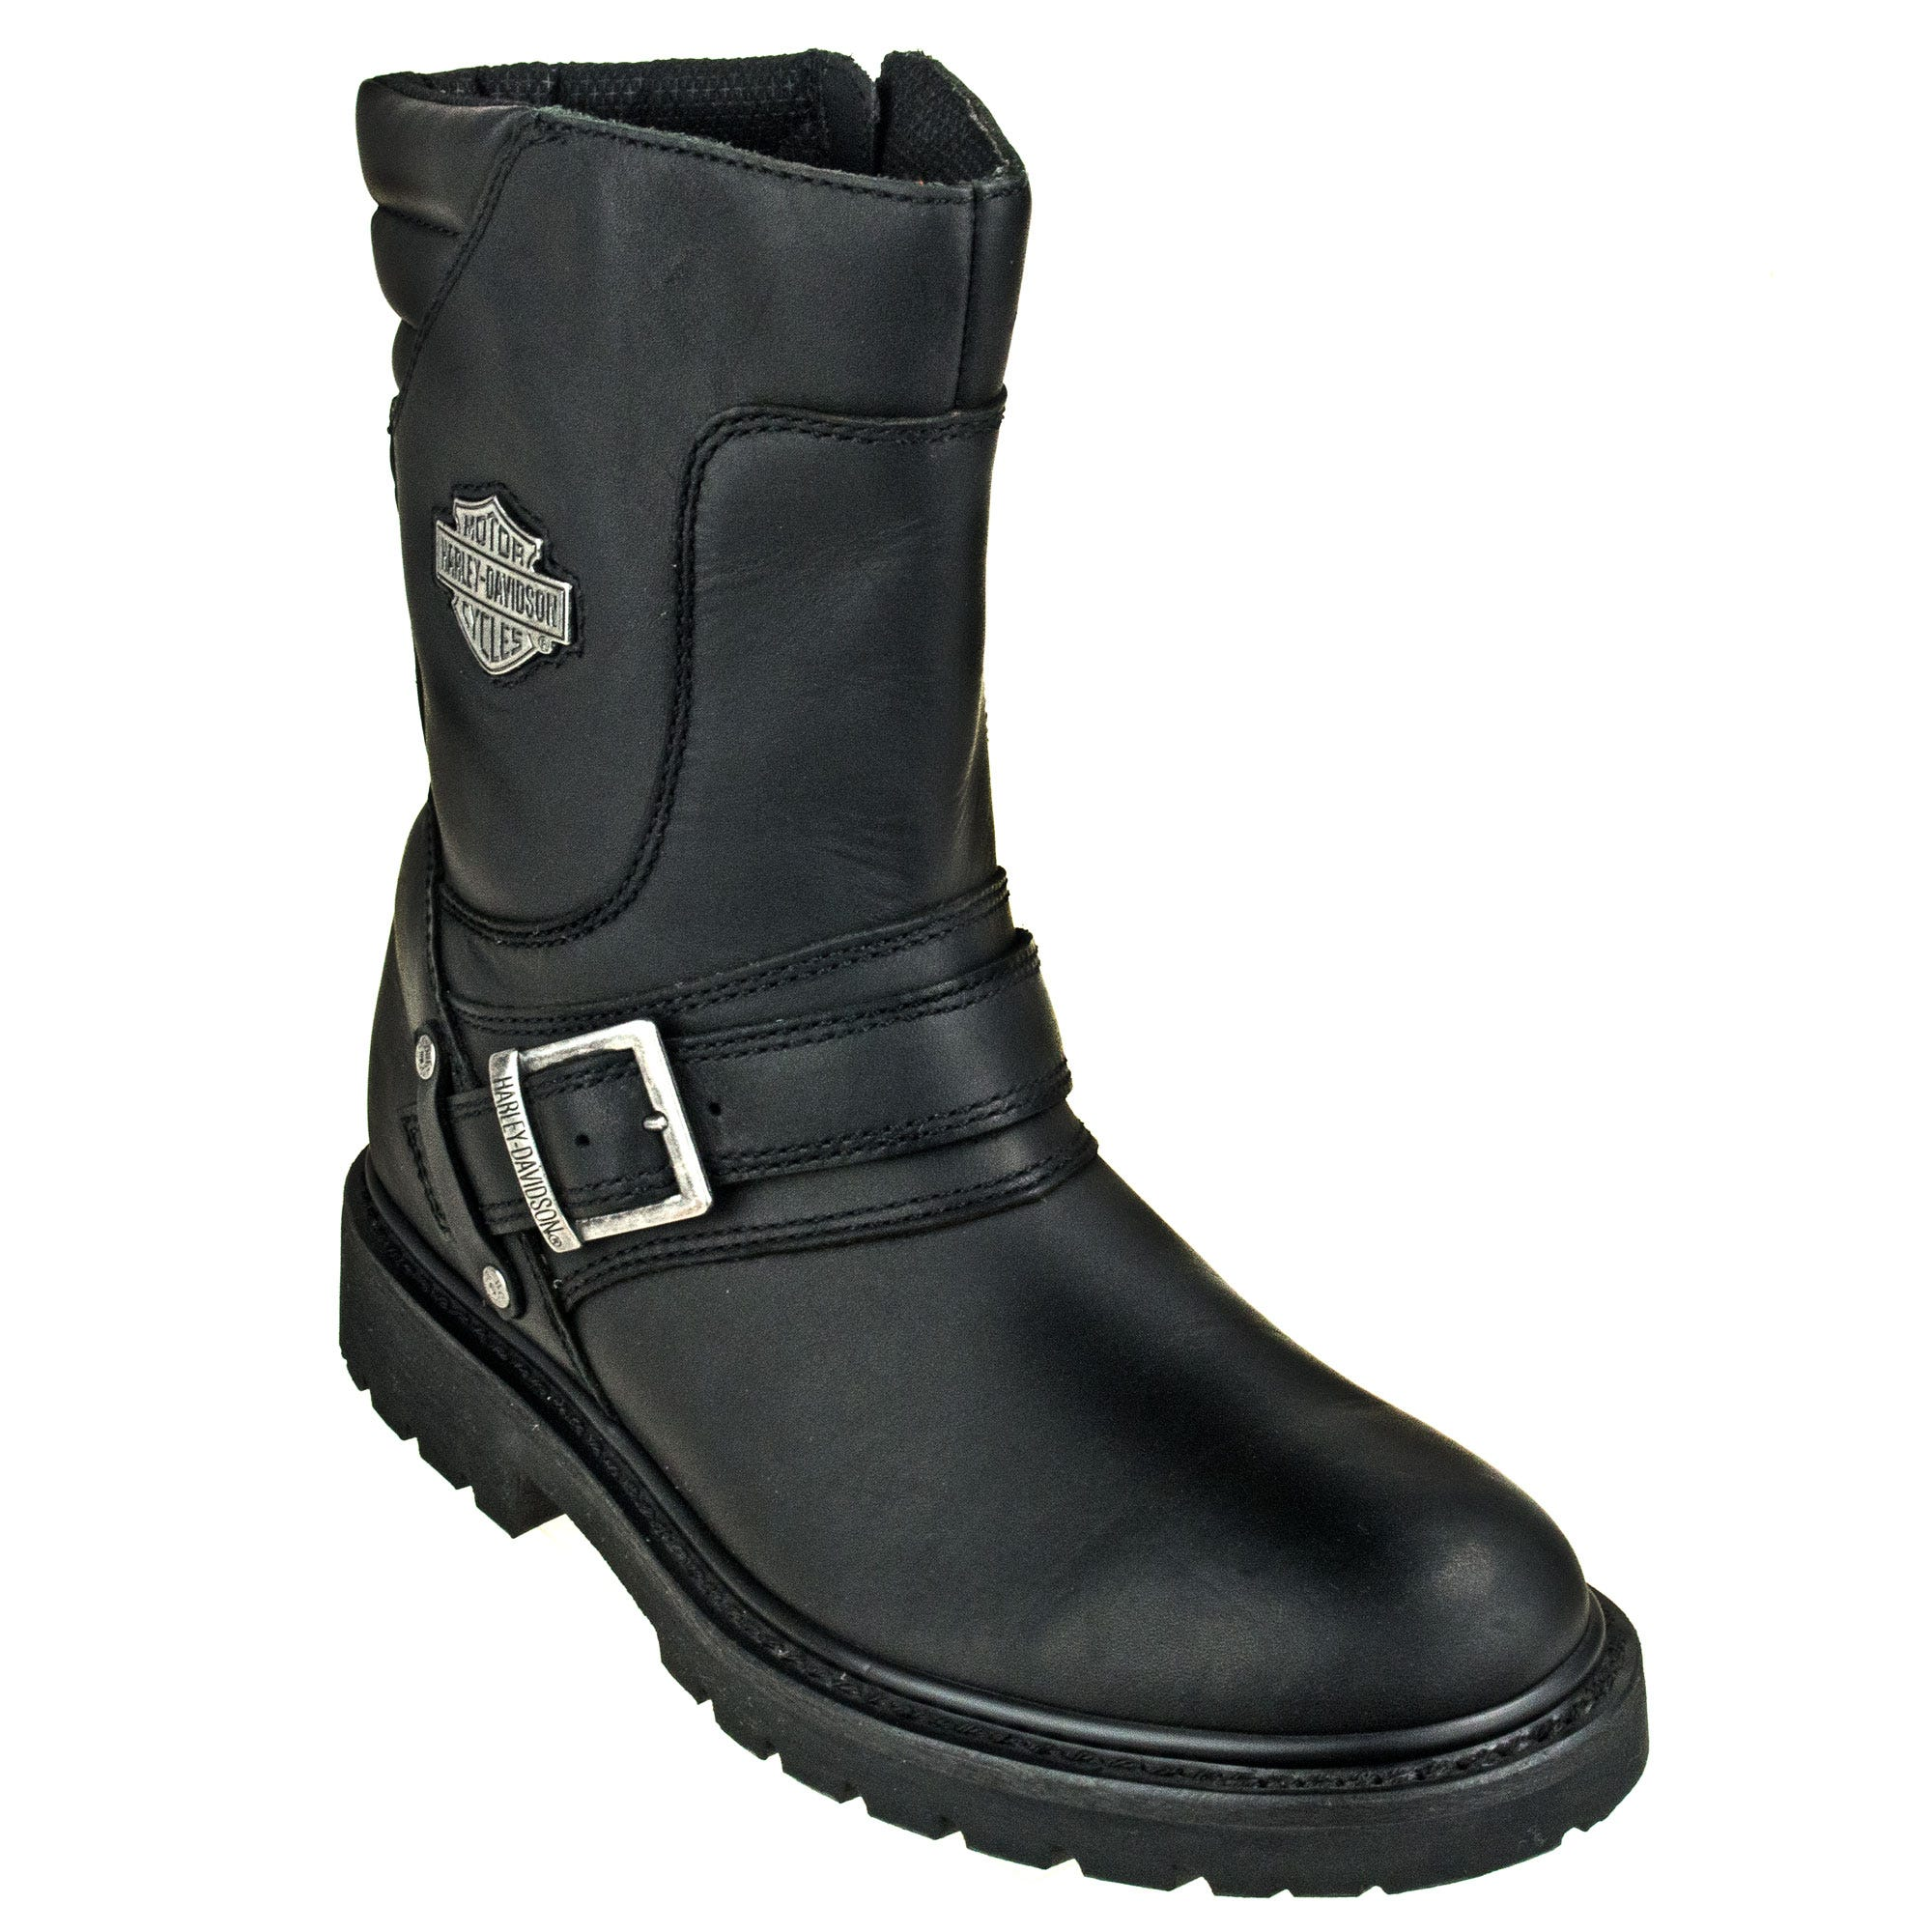 7e3a4a72349d19 Harley Davidson Boots  Men s Black 95194 Booker Side Zip Boots ...